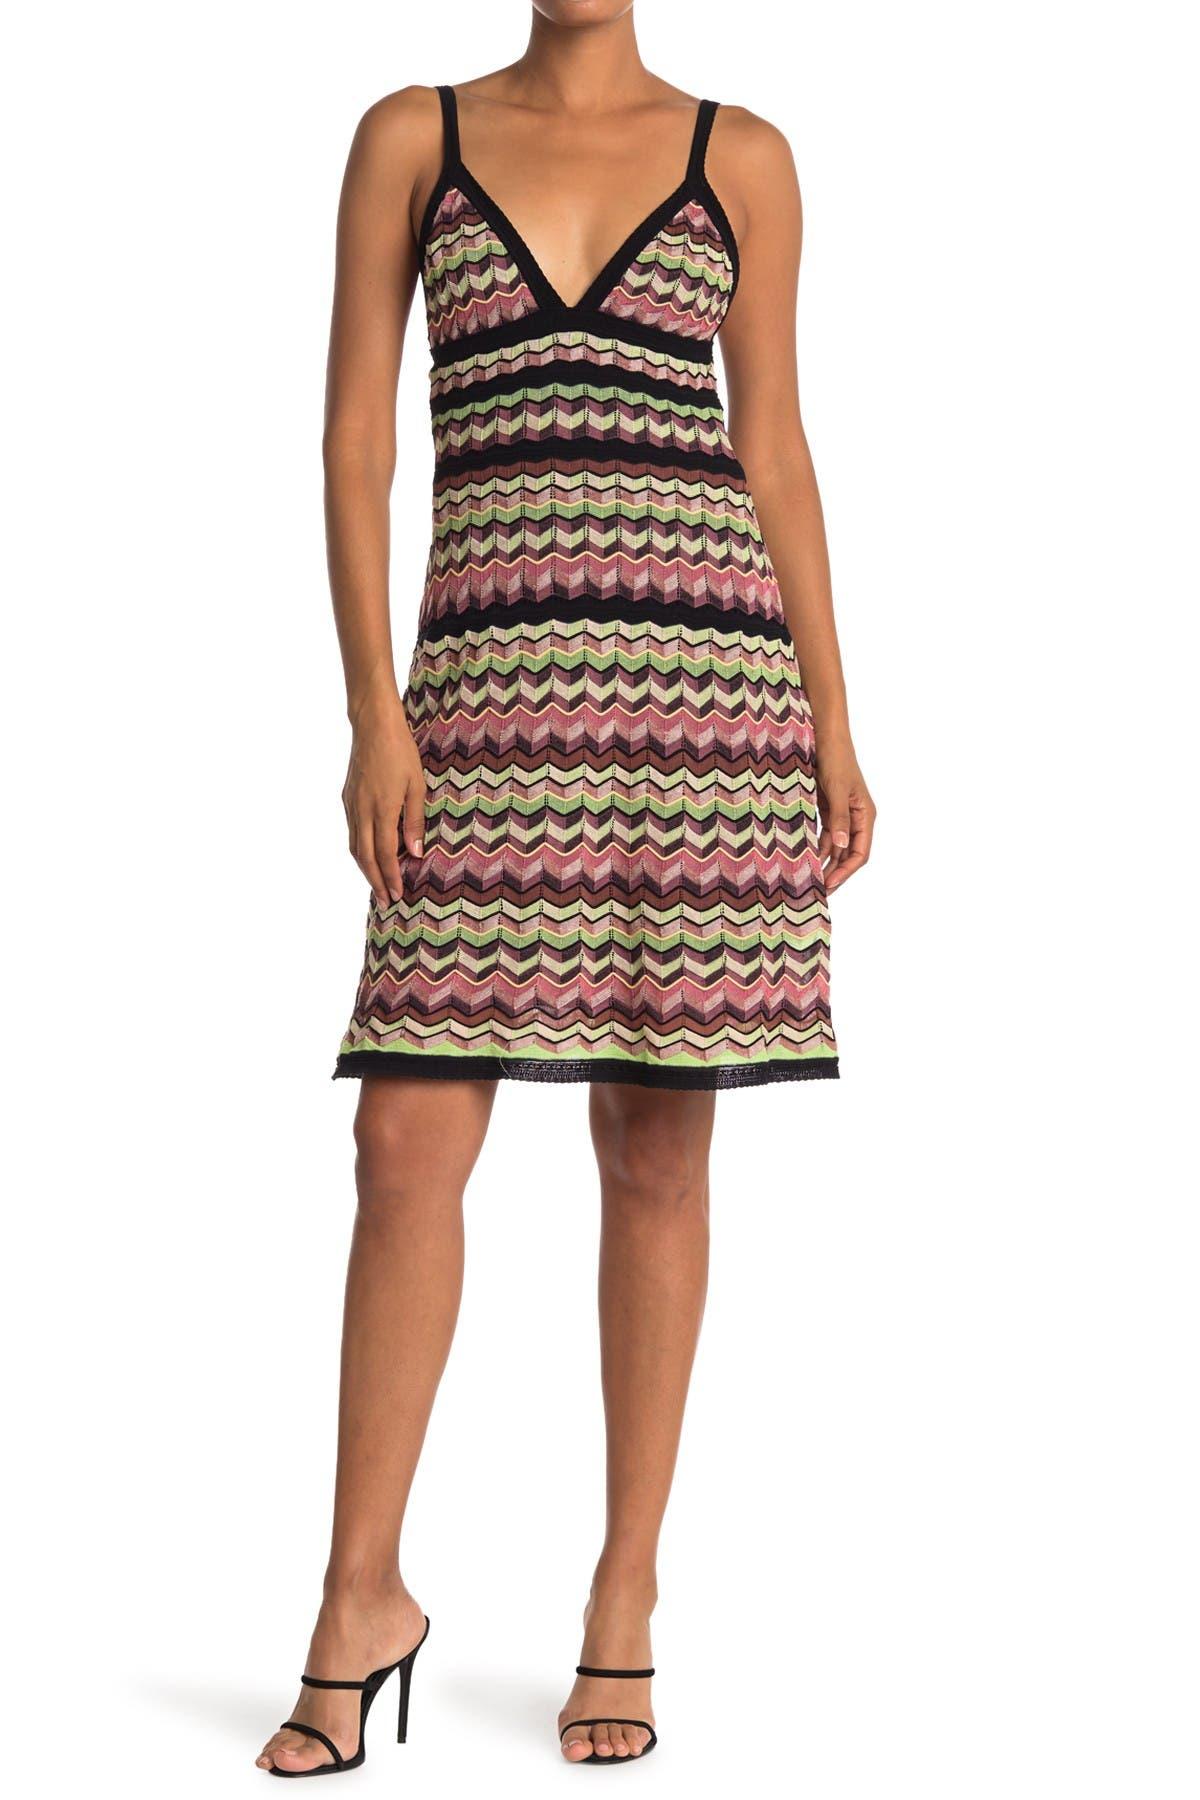 Image of M Missoni Chevron Striped Sleeveless Dress